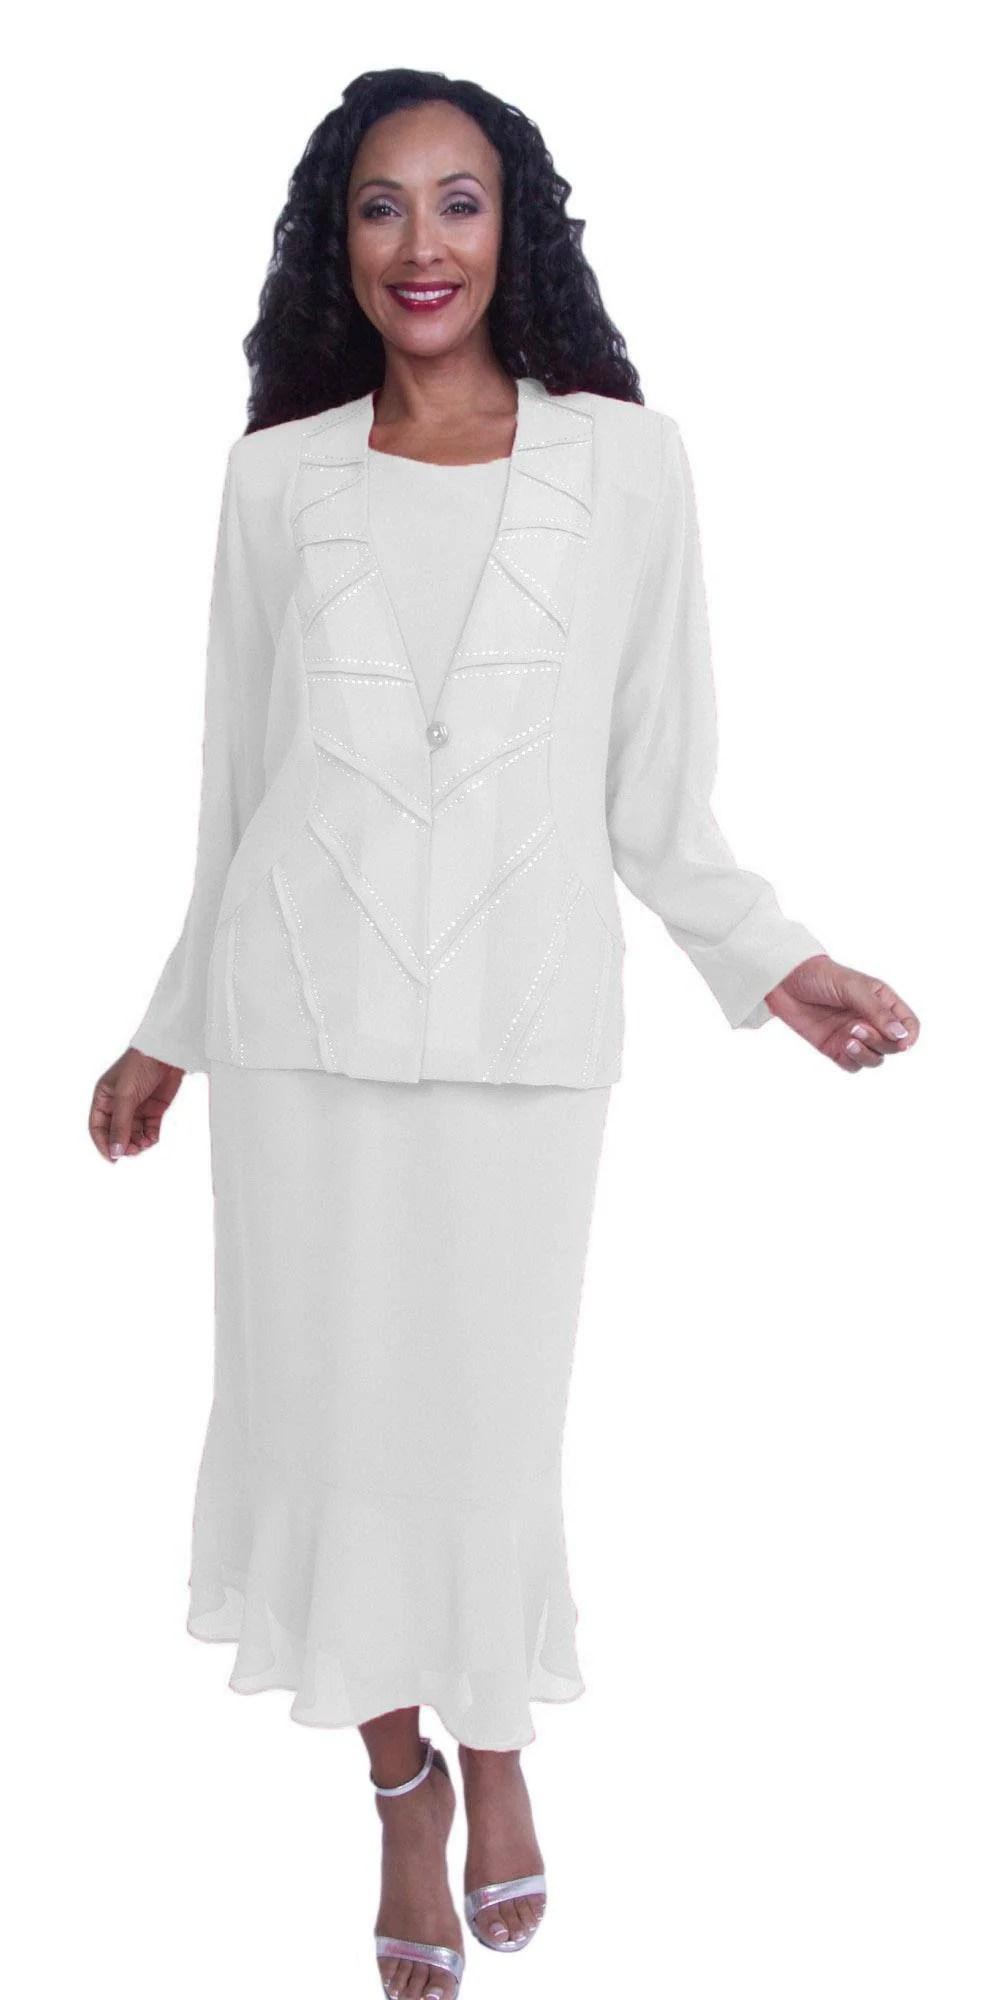 White Long Sleeve Tea Length Dress